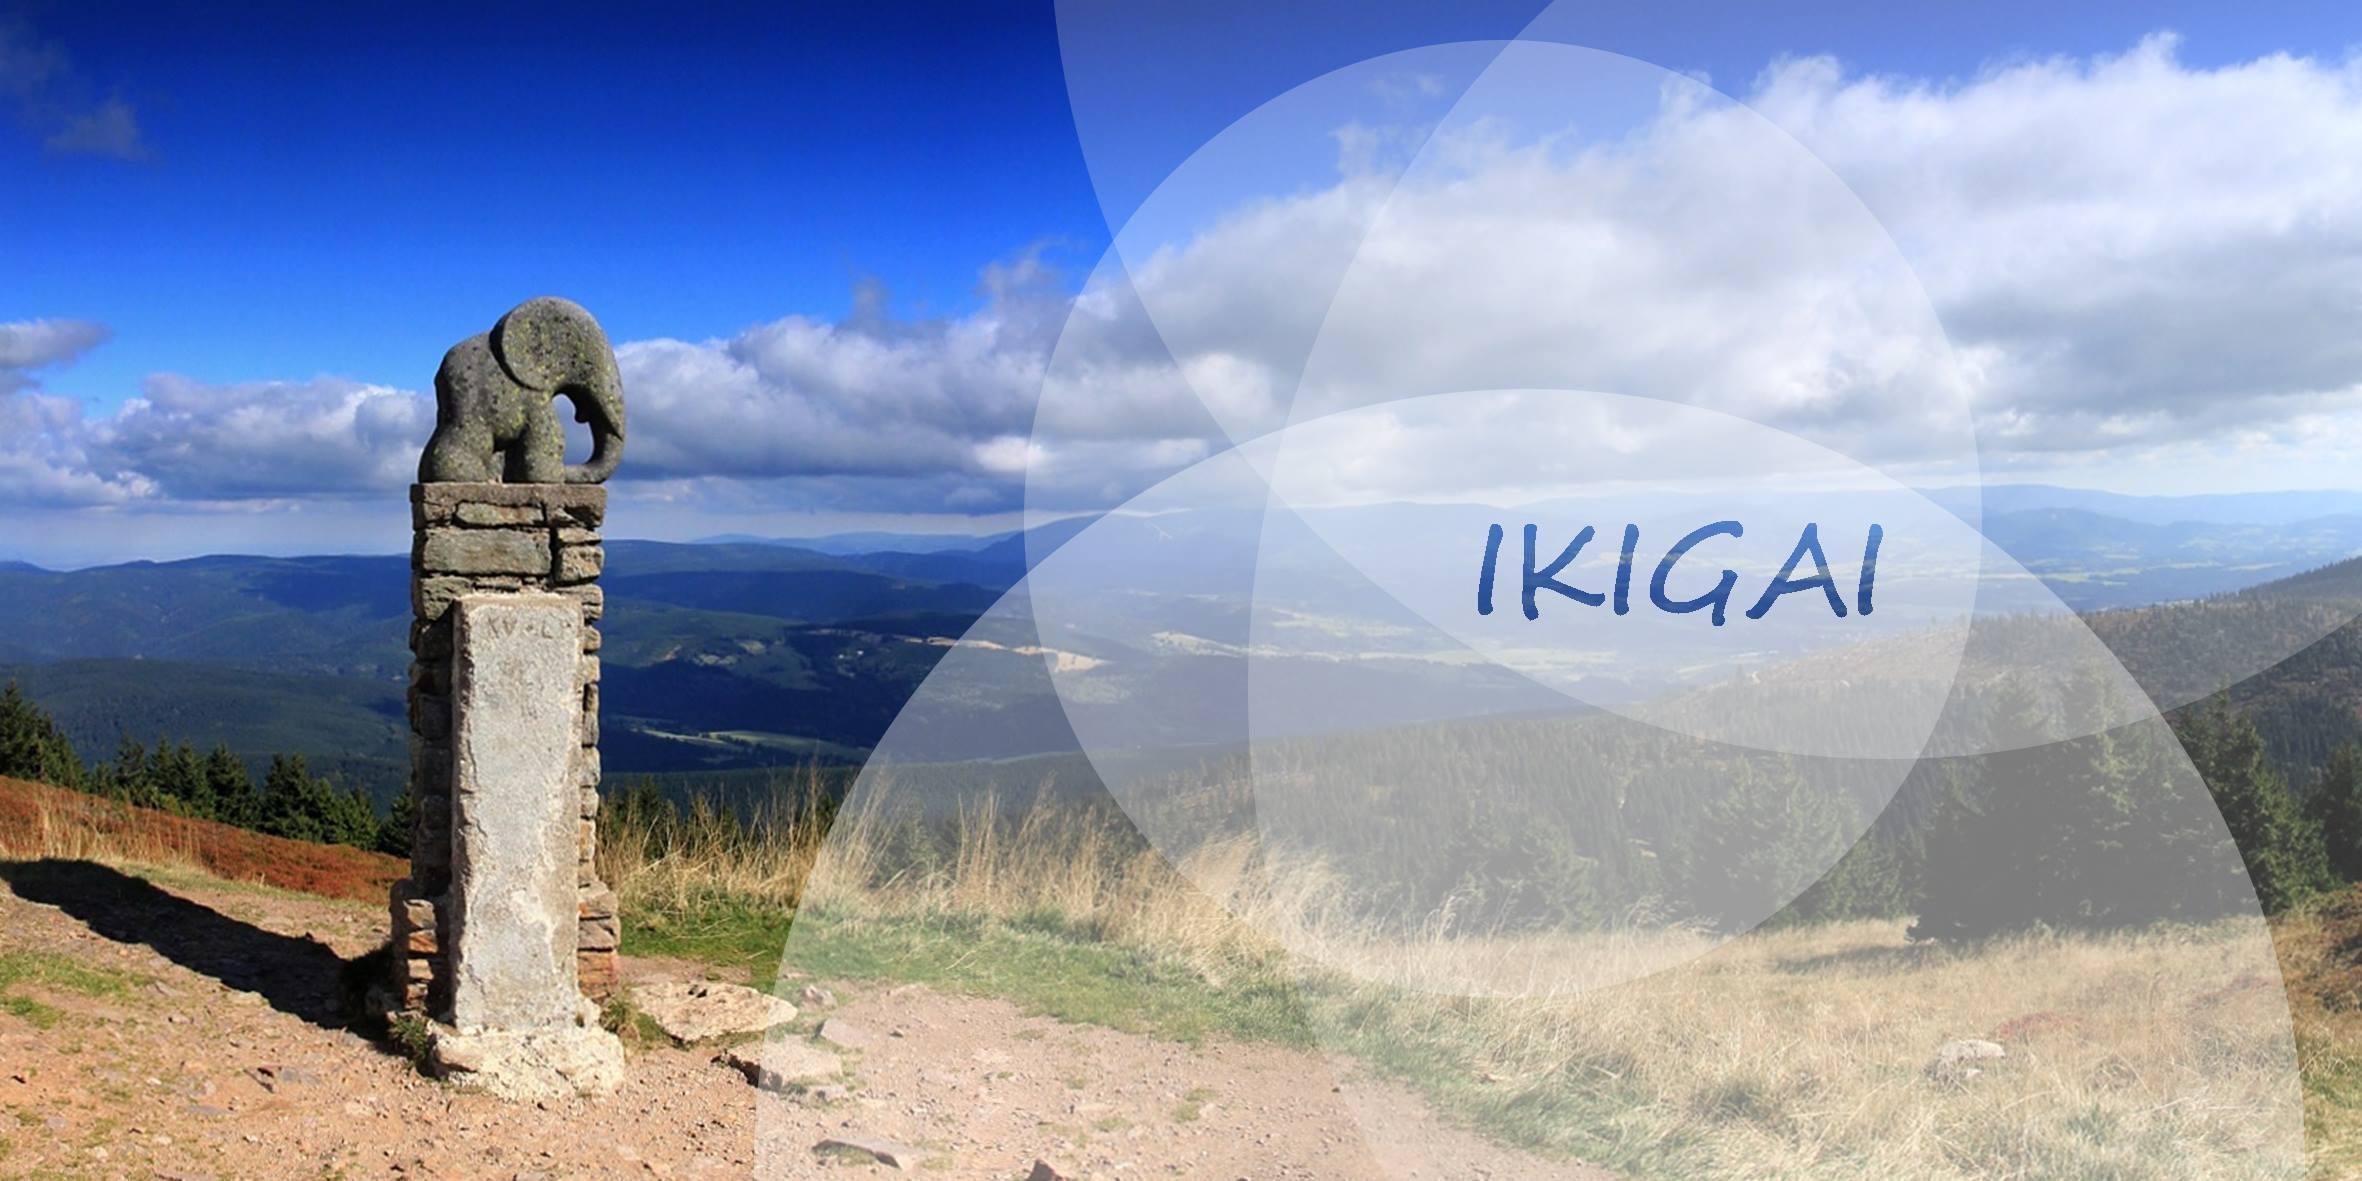 IKIGAI